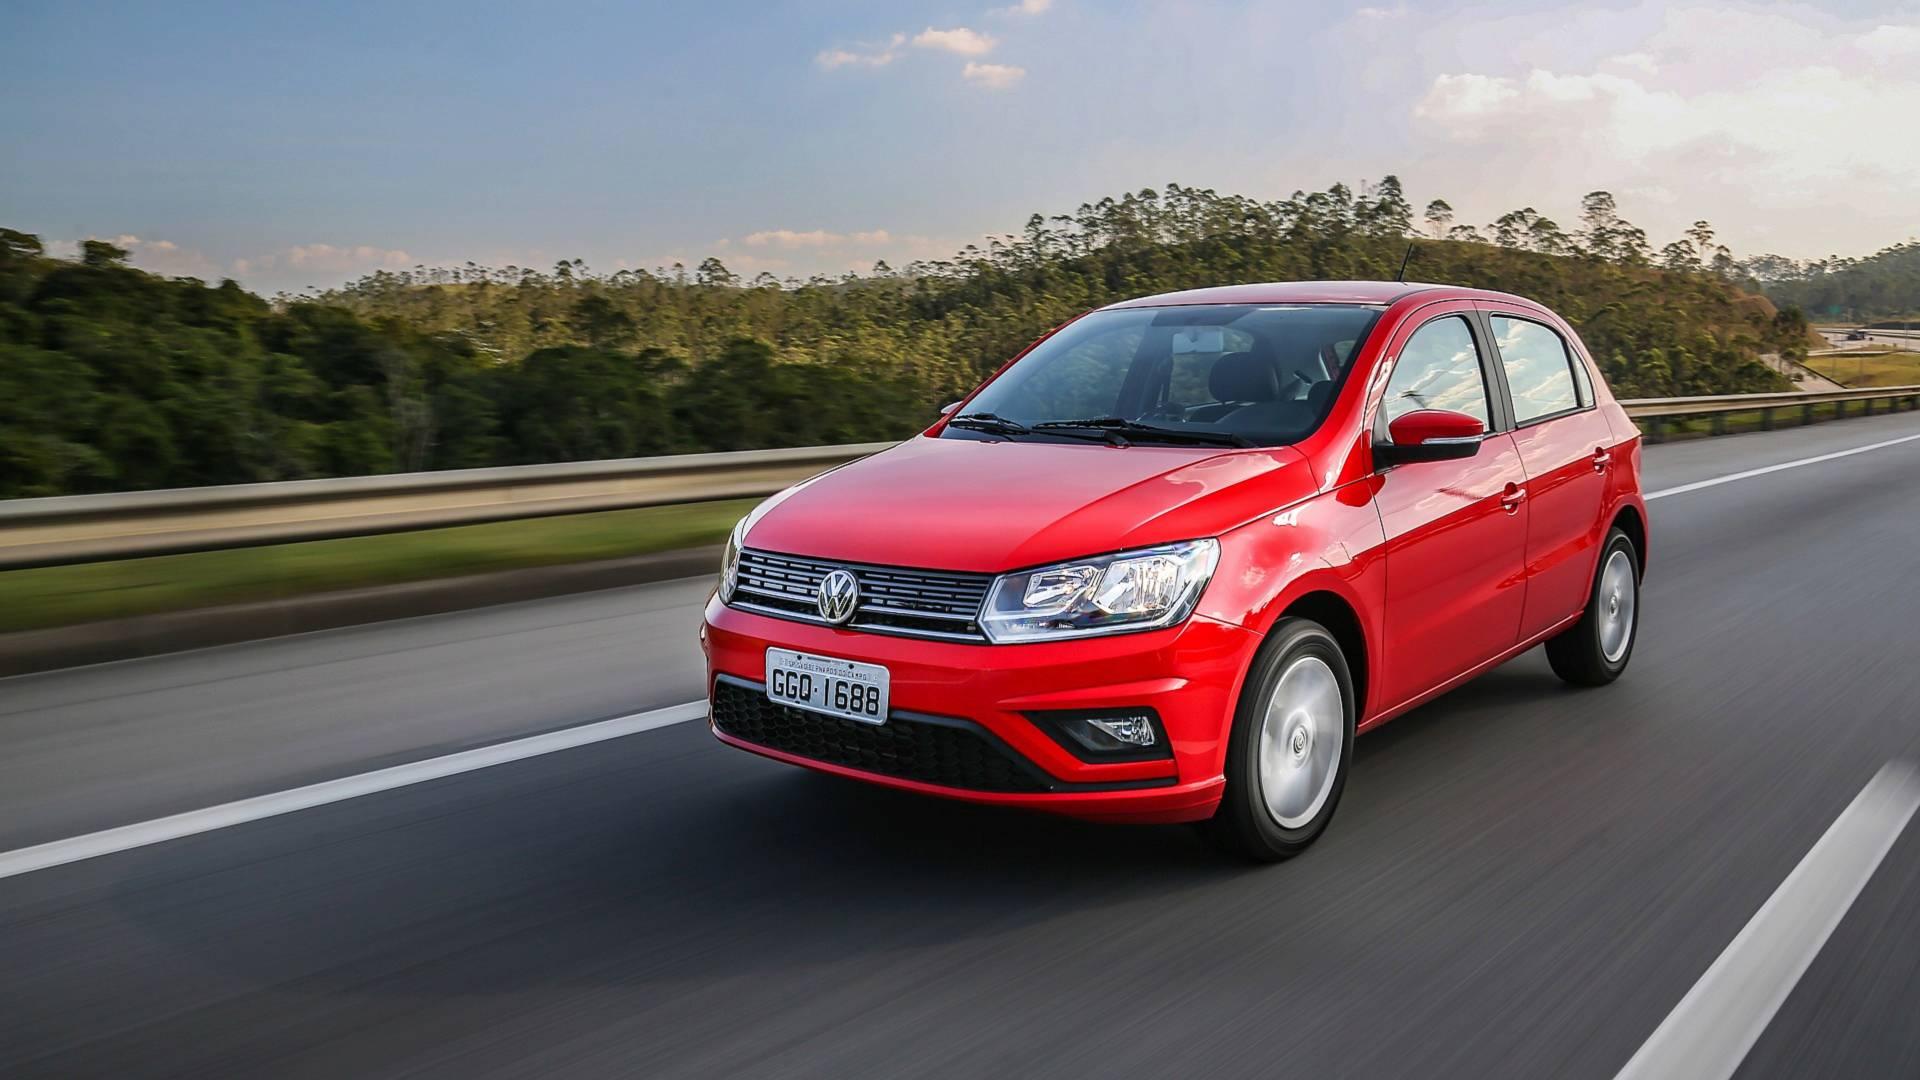 Forum gratis : Compra e venda engenharia Carro Volkswagen-gol-16-msi-at6-2019